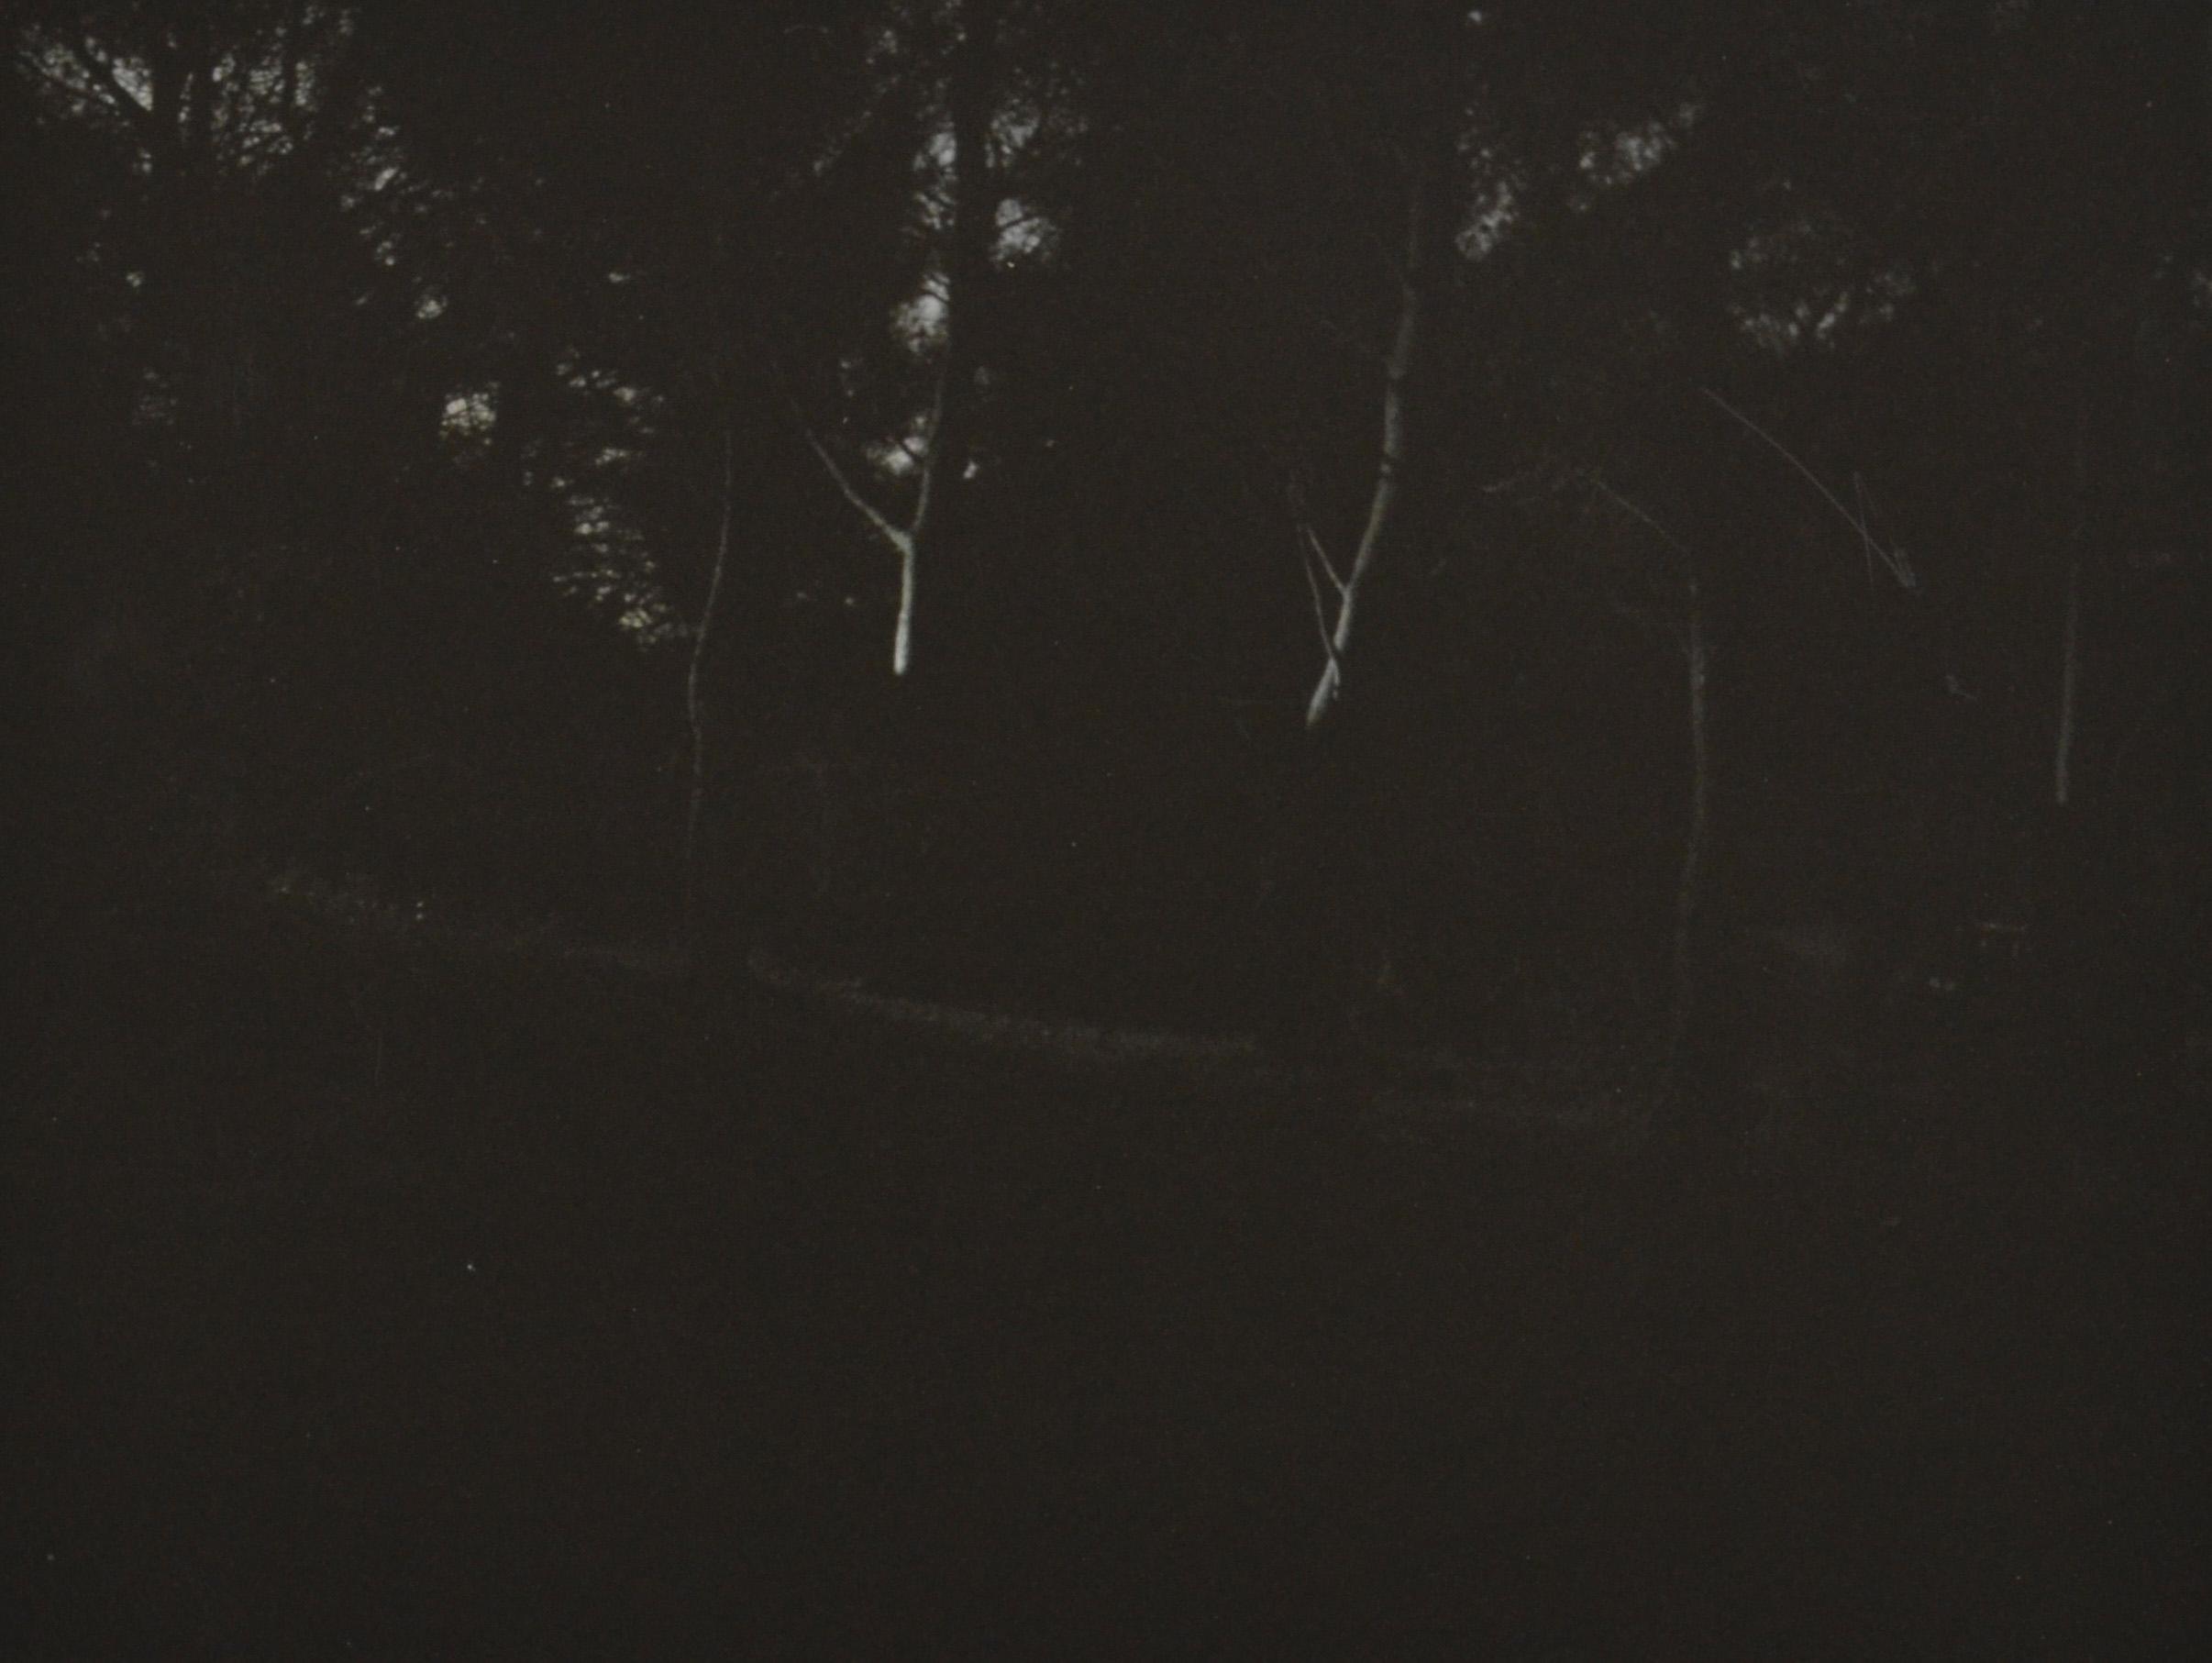 untitled, b/w print, 30 x 40 cm, 2011